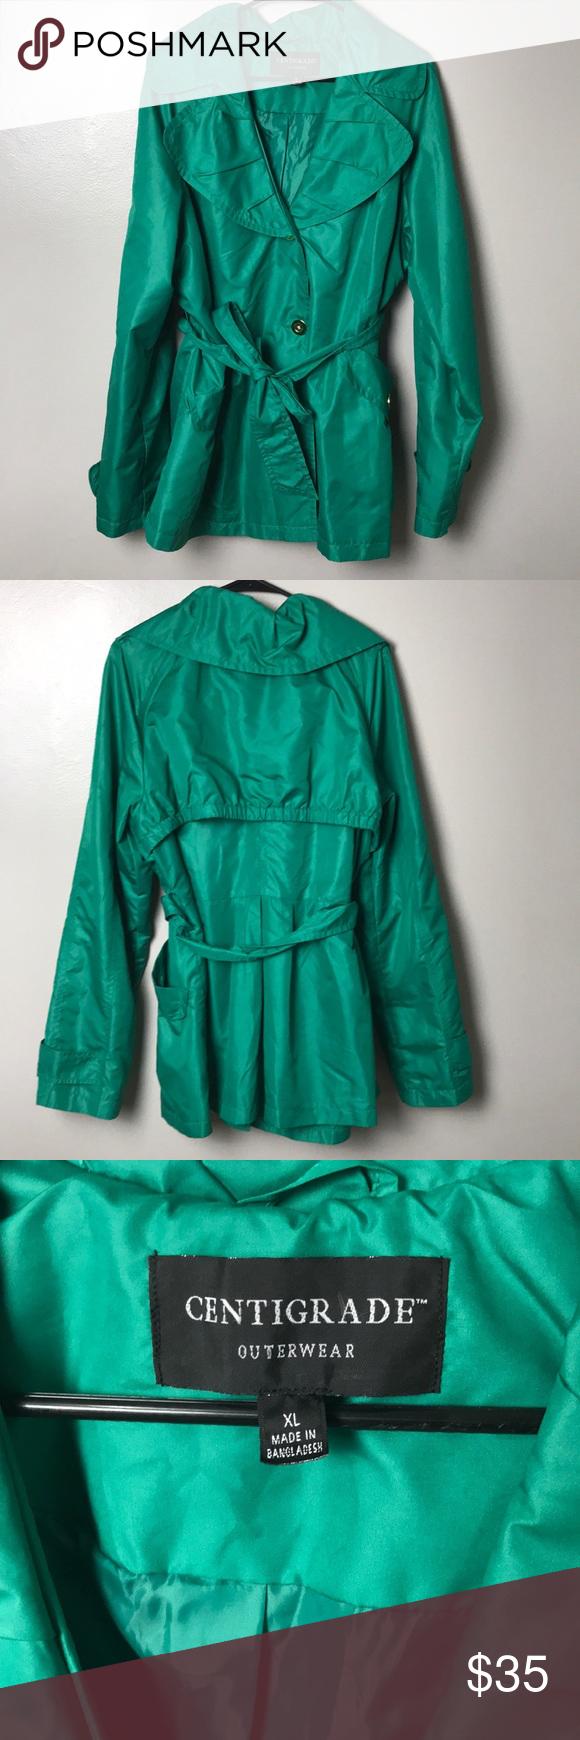 Centigrade Outerwear Green Rain Coat Xl Outerwear Clothes Design Raincoat [ 1740 x 580 Pixel ]